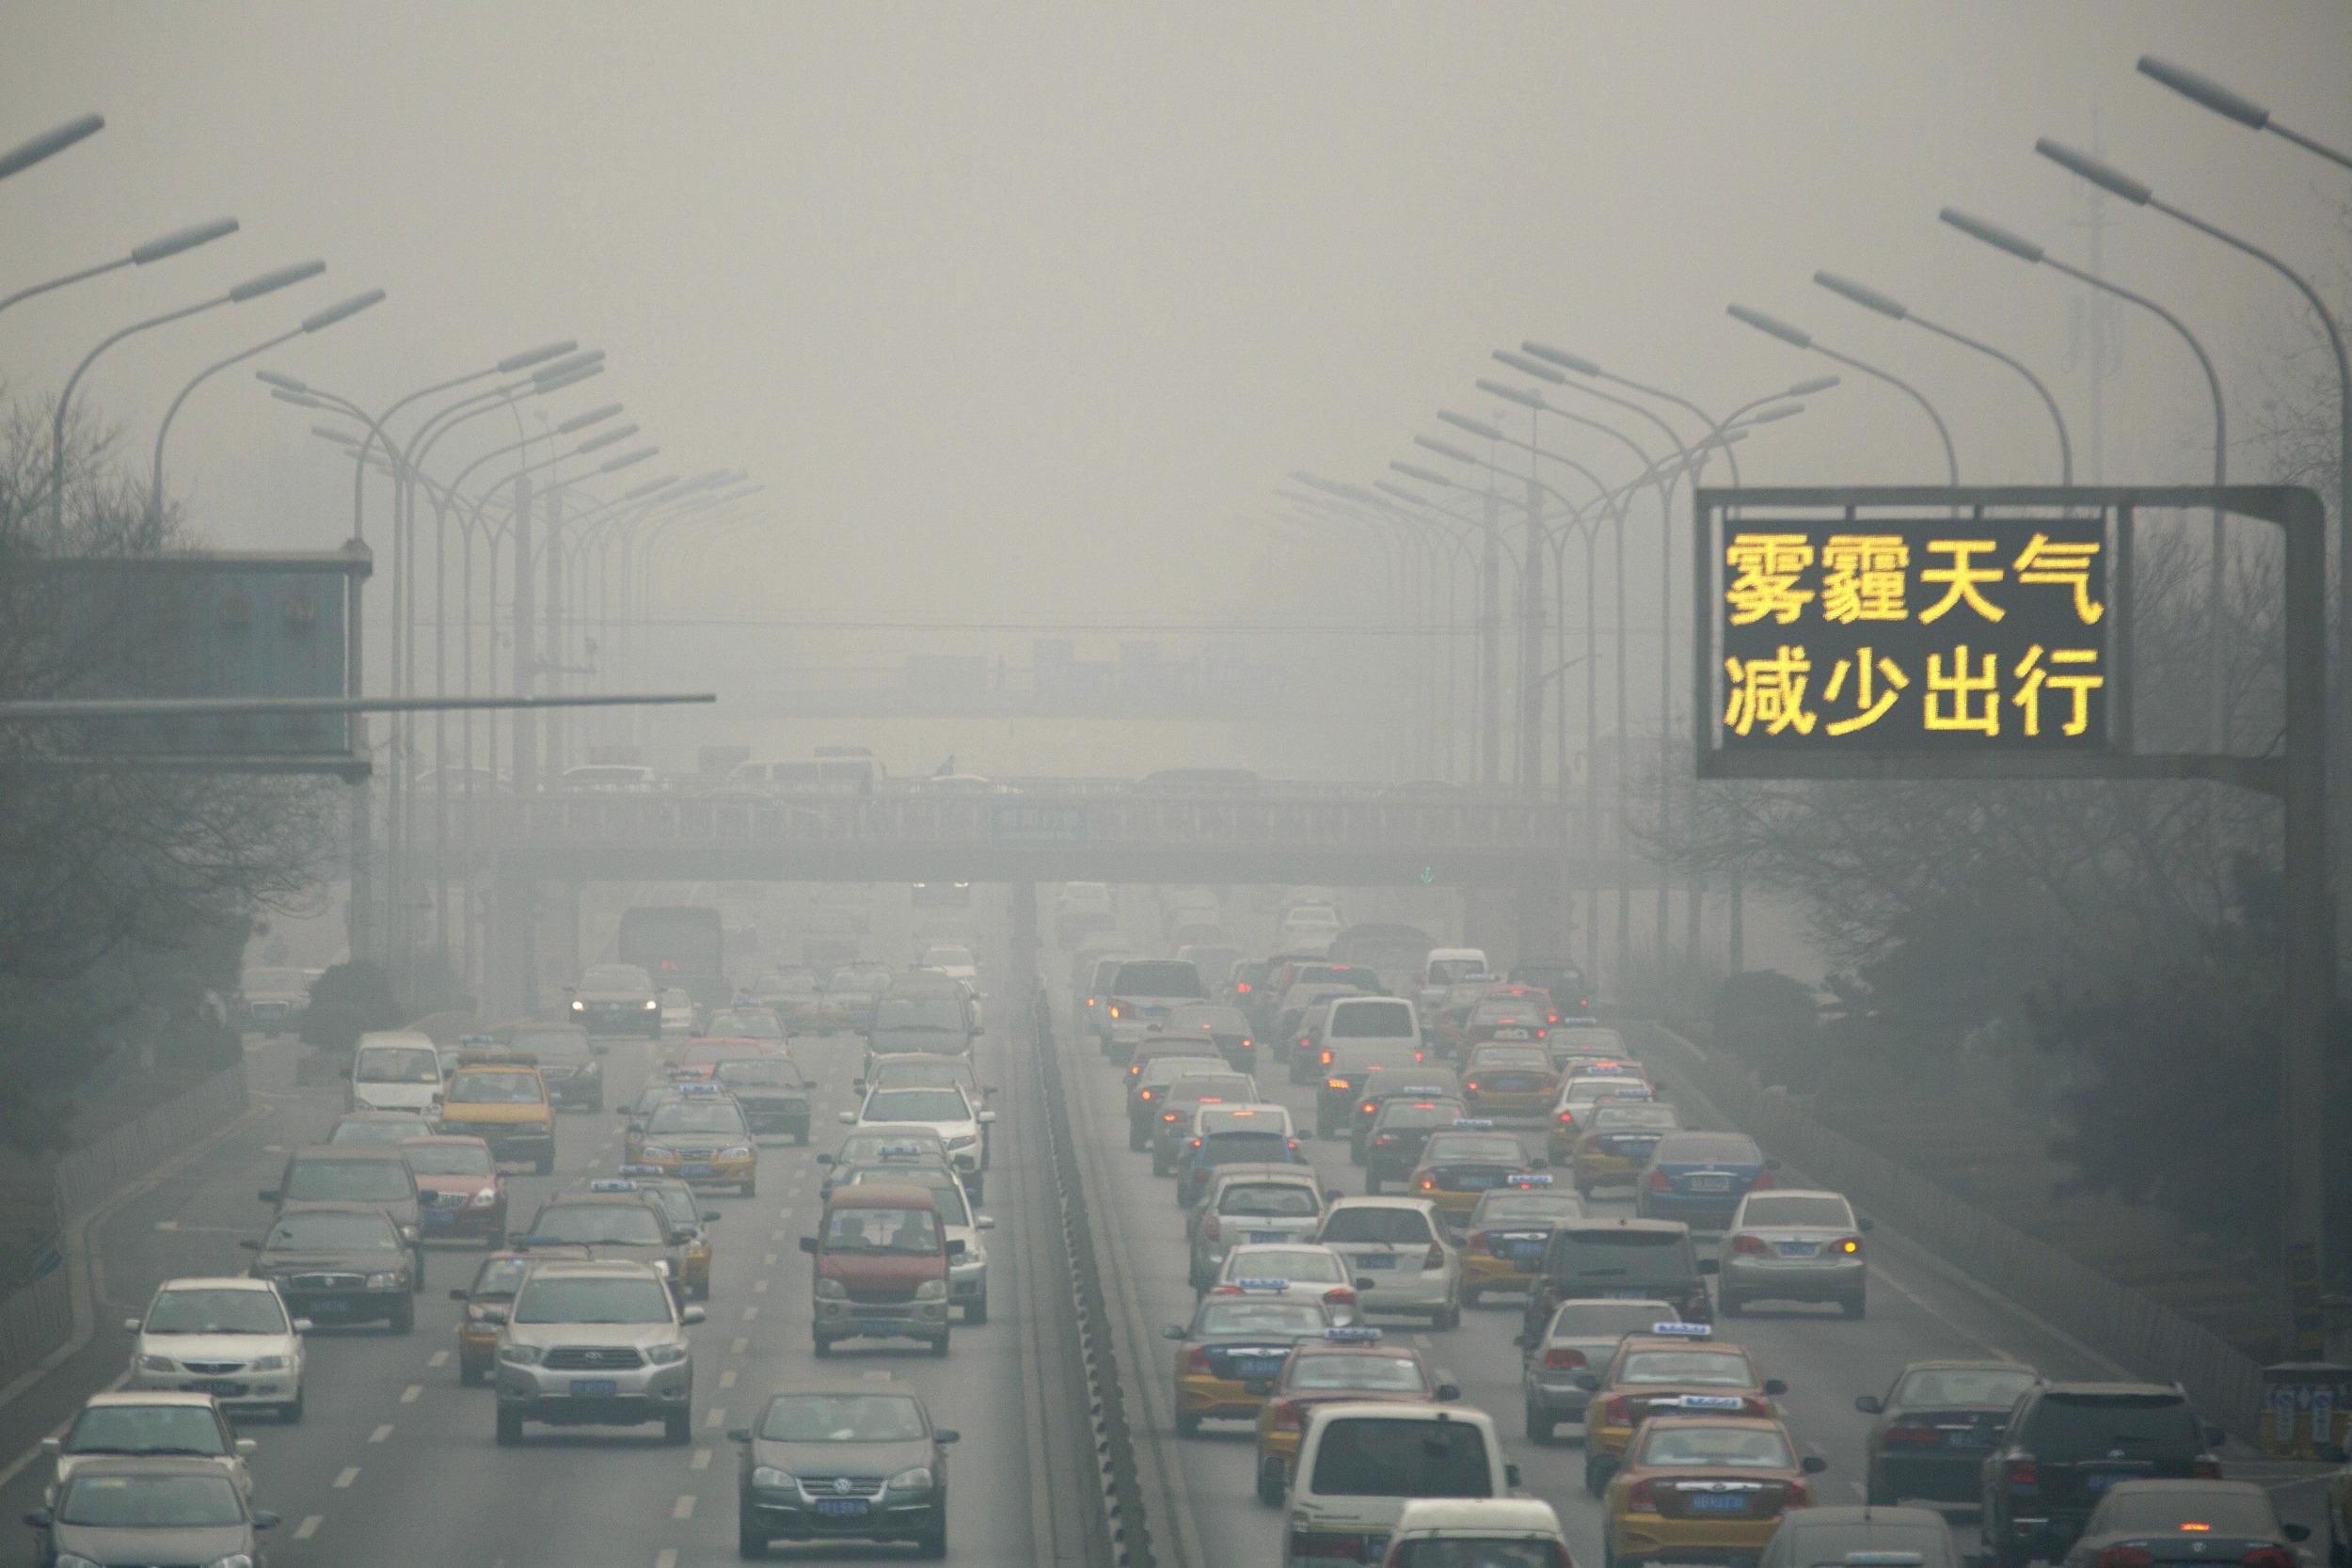 Image: Severe smog in Beijing, China